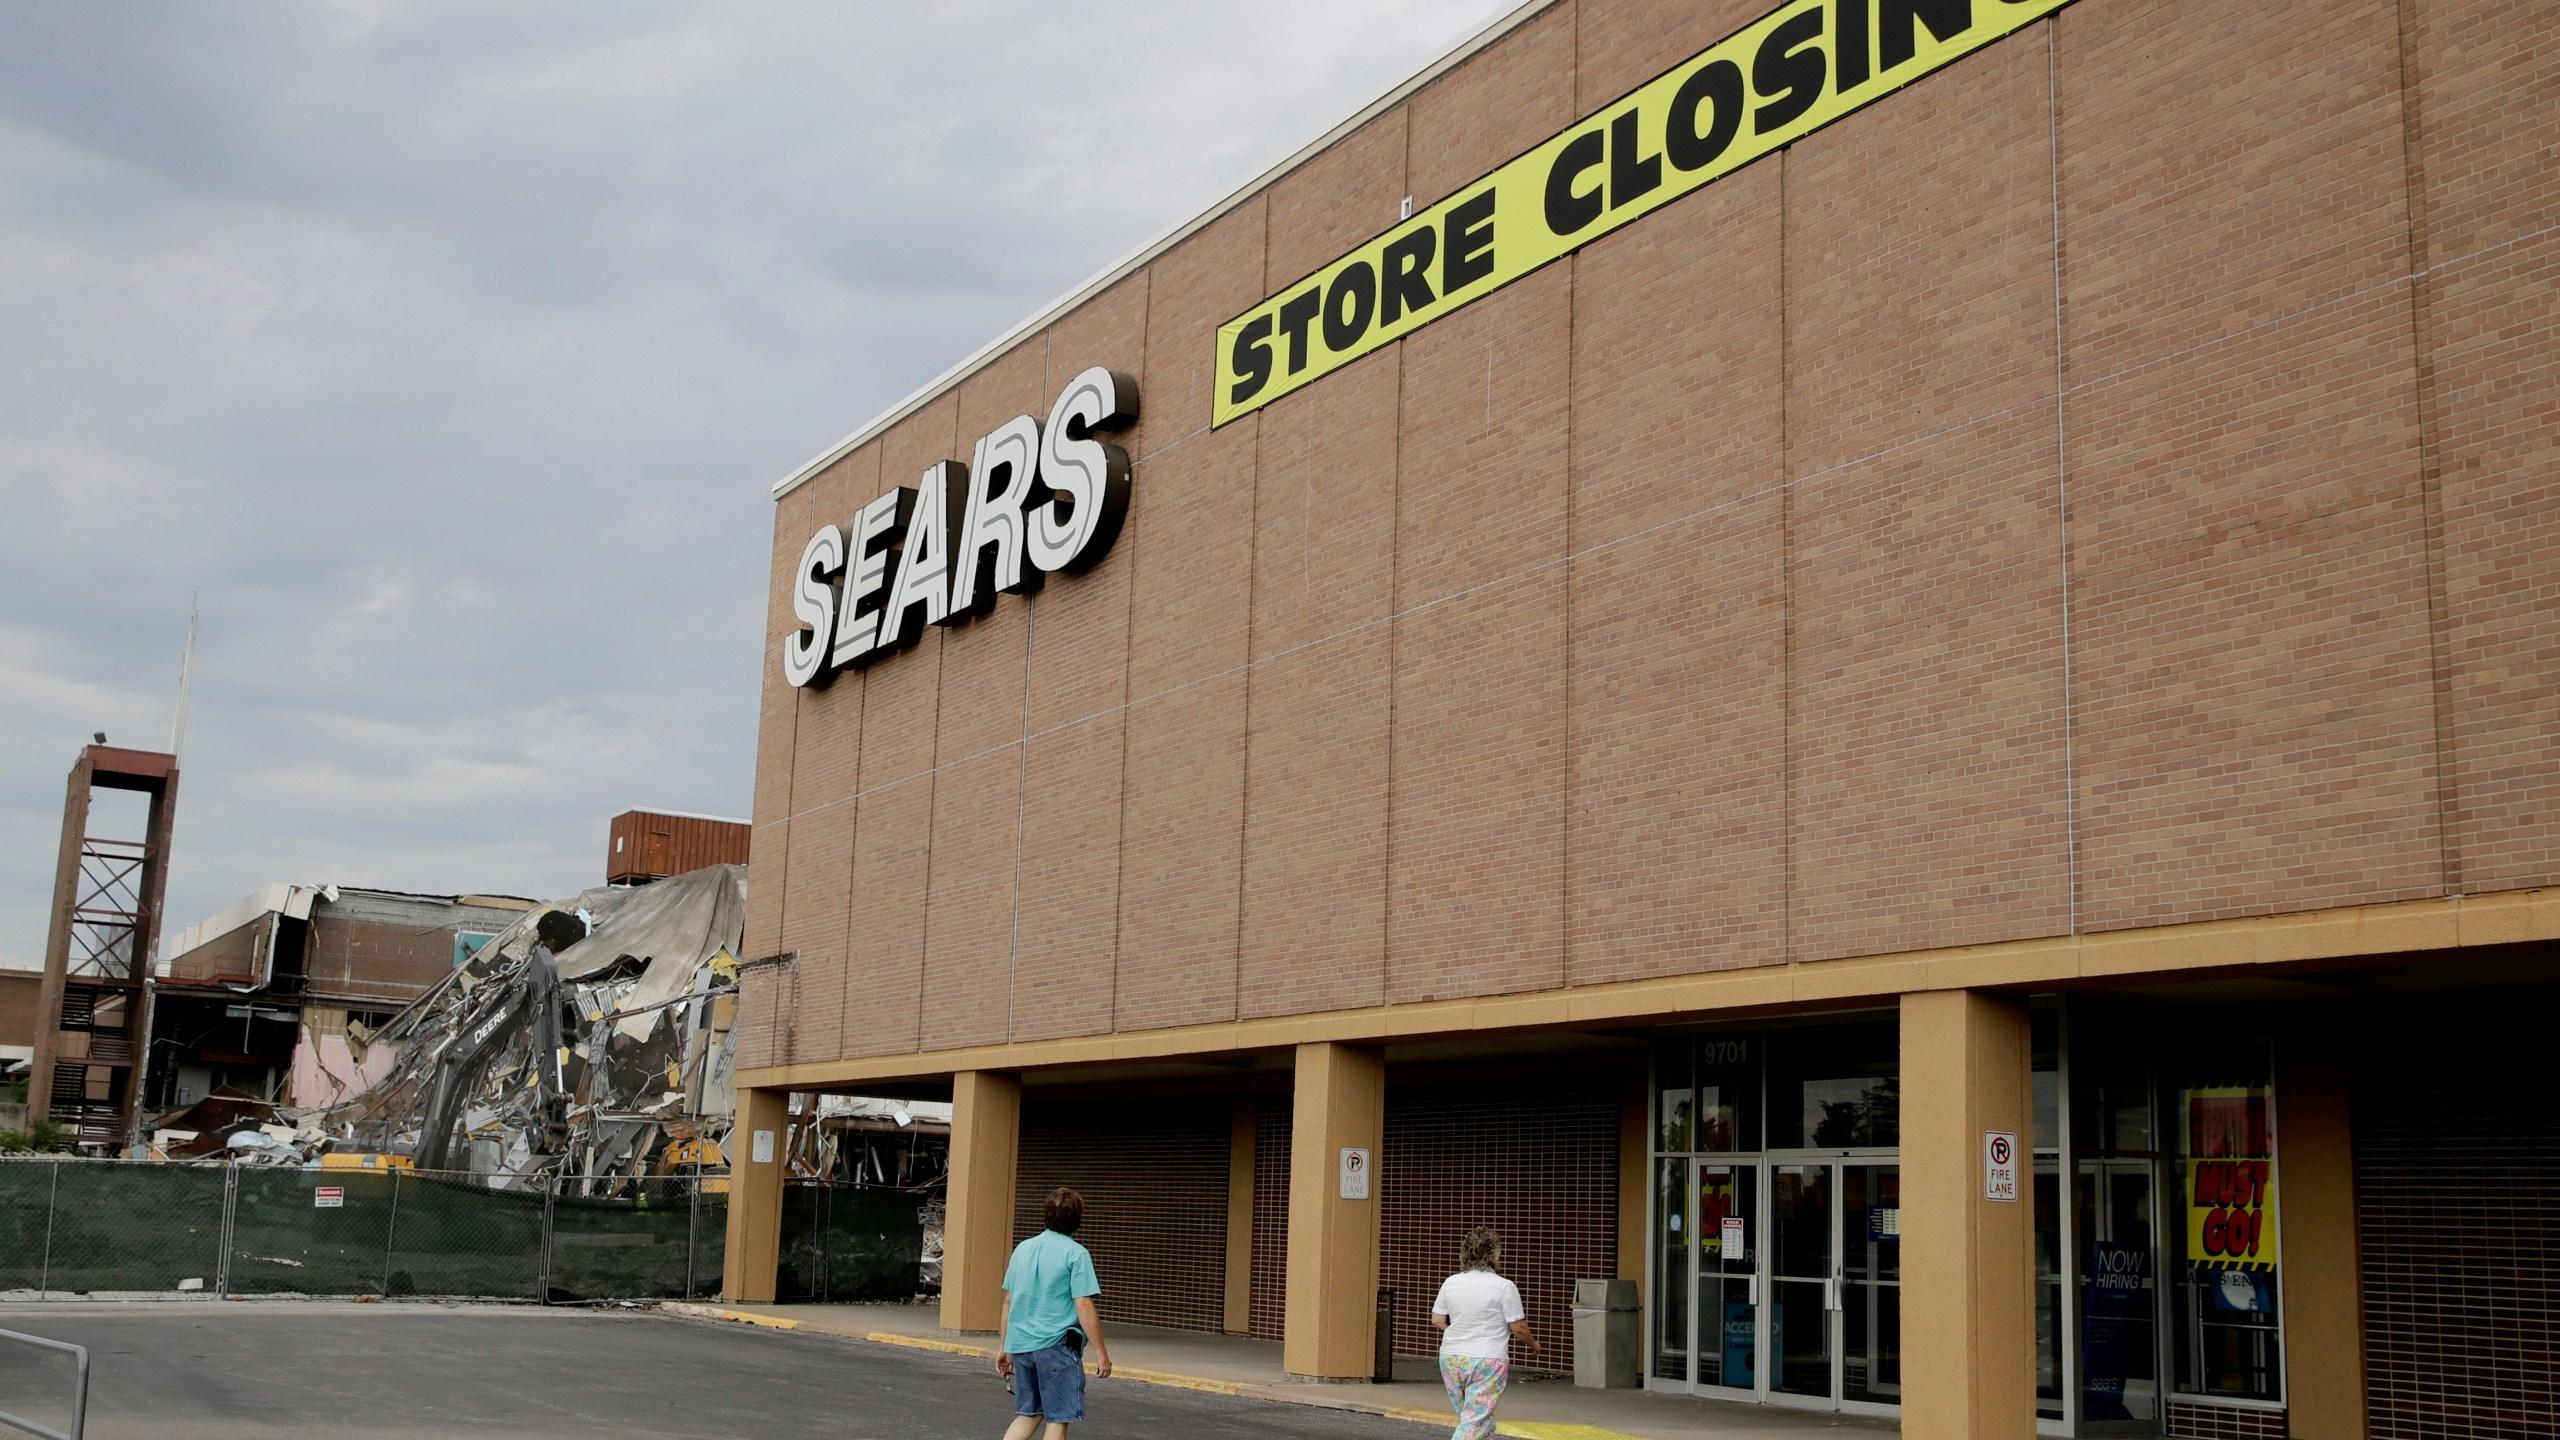 Sears_25780-159532.jpg87405747